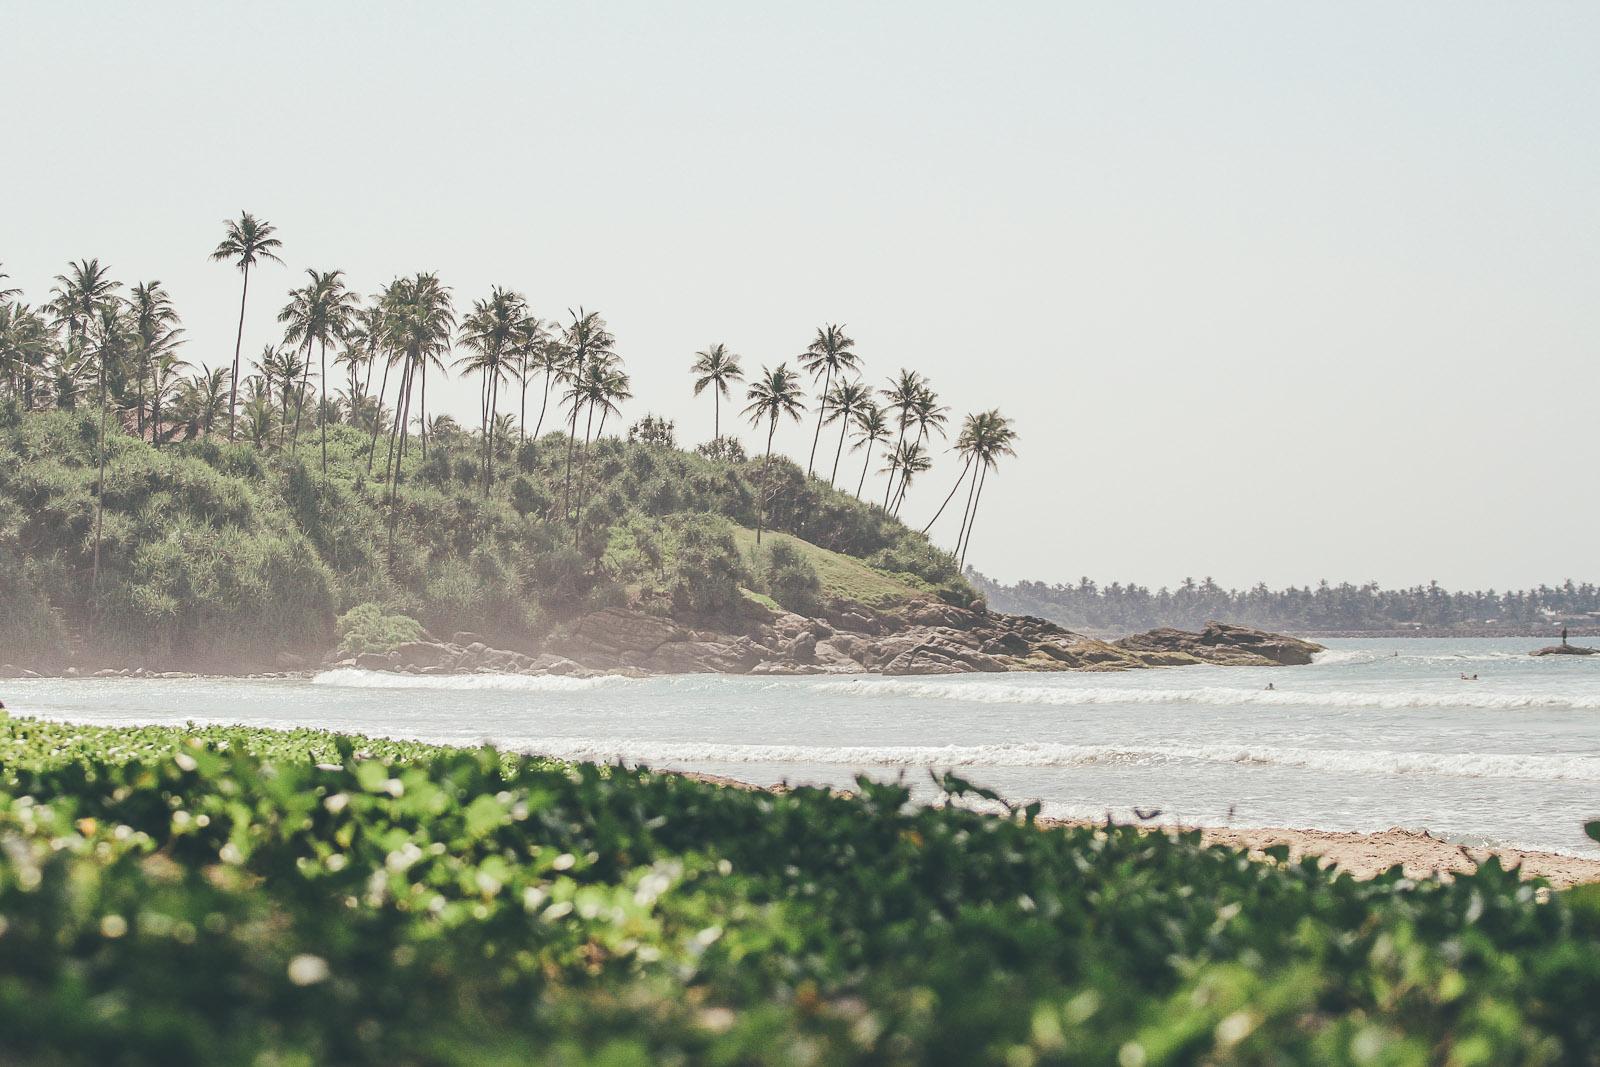 Sunshinestories-Sri-Lanka-Medawatta-Medawata-Meda-Watta-Mada-surf-Lonboard-Surfing-Wave-Surf-School-Camp-Yoga-Studio-IMG_0296